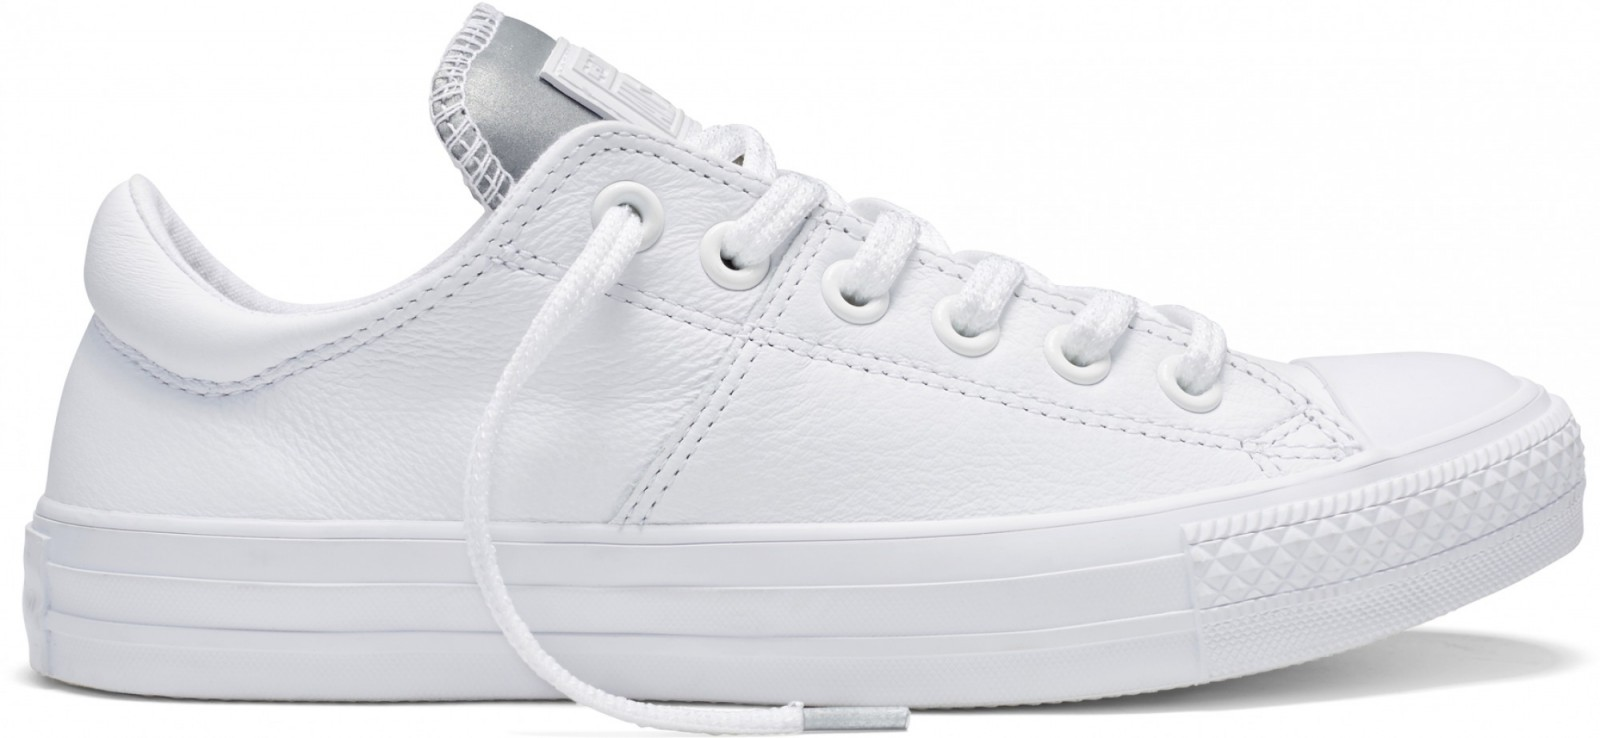 d65902b5149 Dámské boty Converse Chuck Taylor All Star Madison bílé